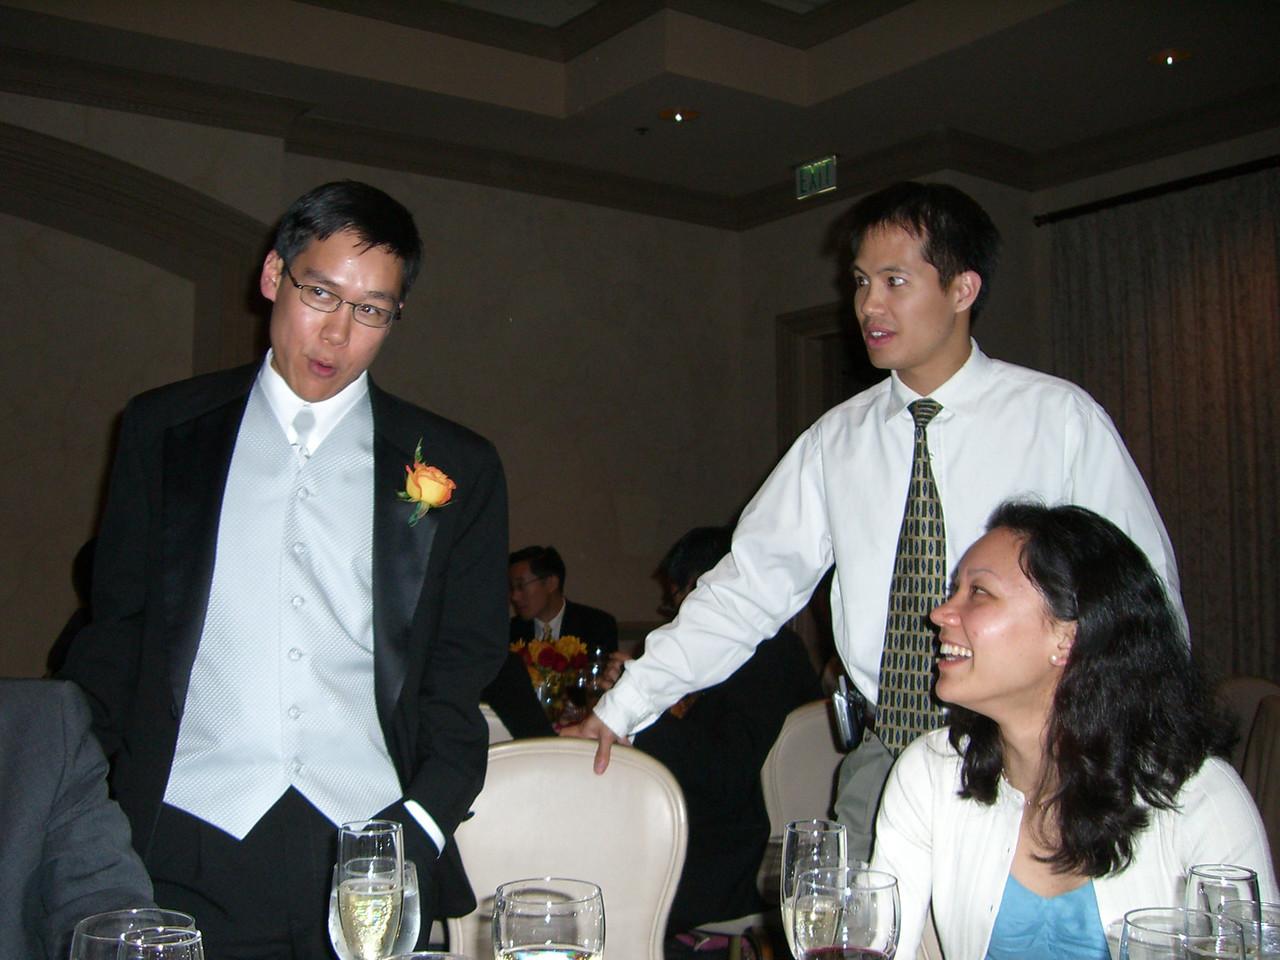 Best man Steve Lee, Sam Chung, and Emy Chen